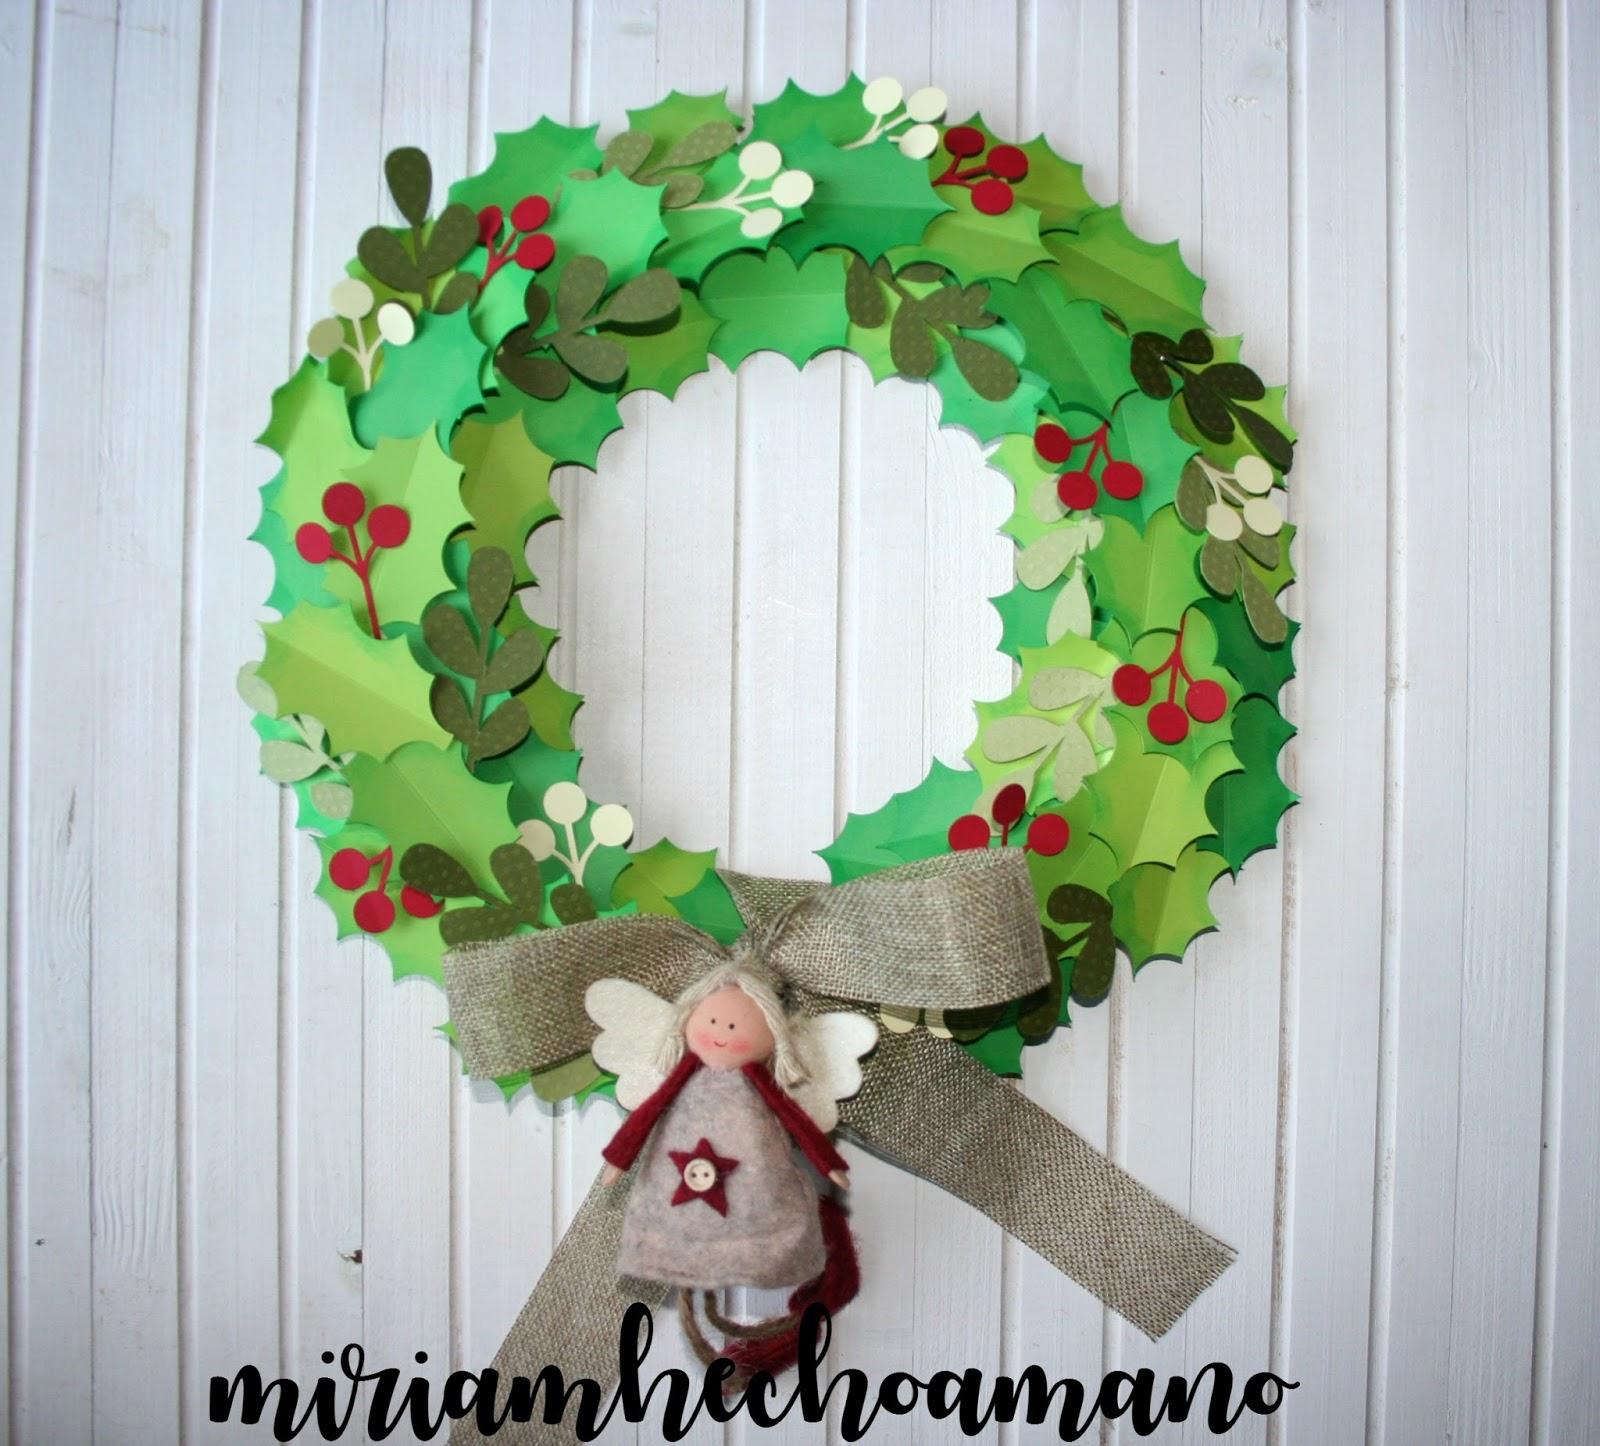 Miriam Hecho A Mano Corona Navideña Hecha A Mano Decoración De Navidad Con Mi Silhouette Cameo